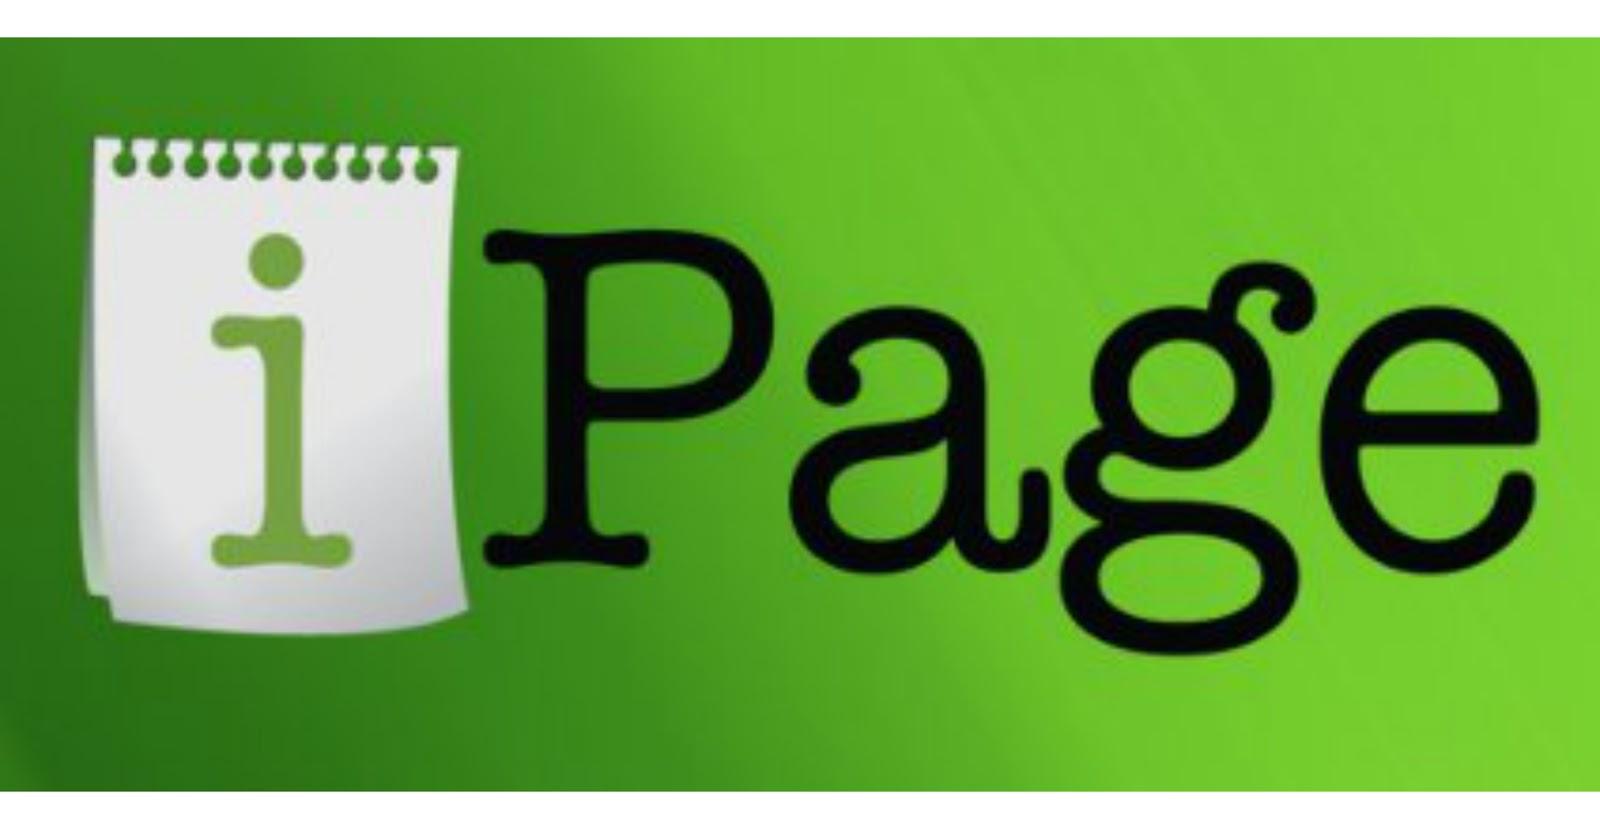 IPAGE WEB HOSTING COMPANY PROFILE - DYNASTER ENTERPRISE